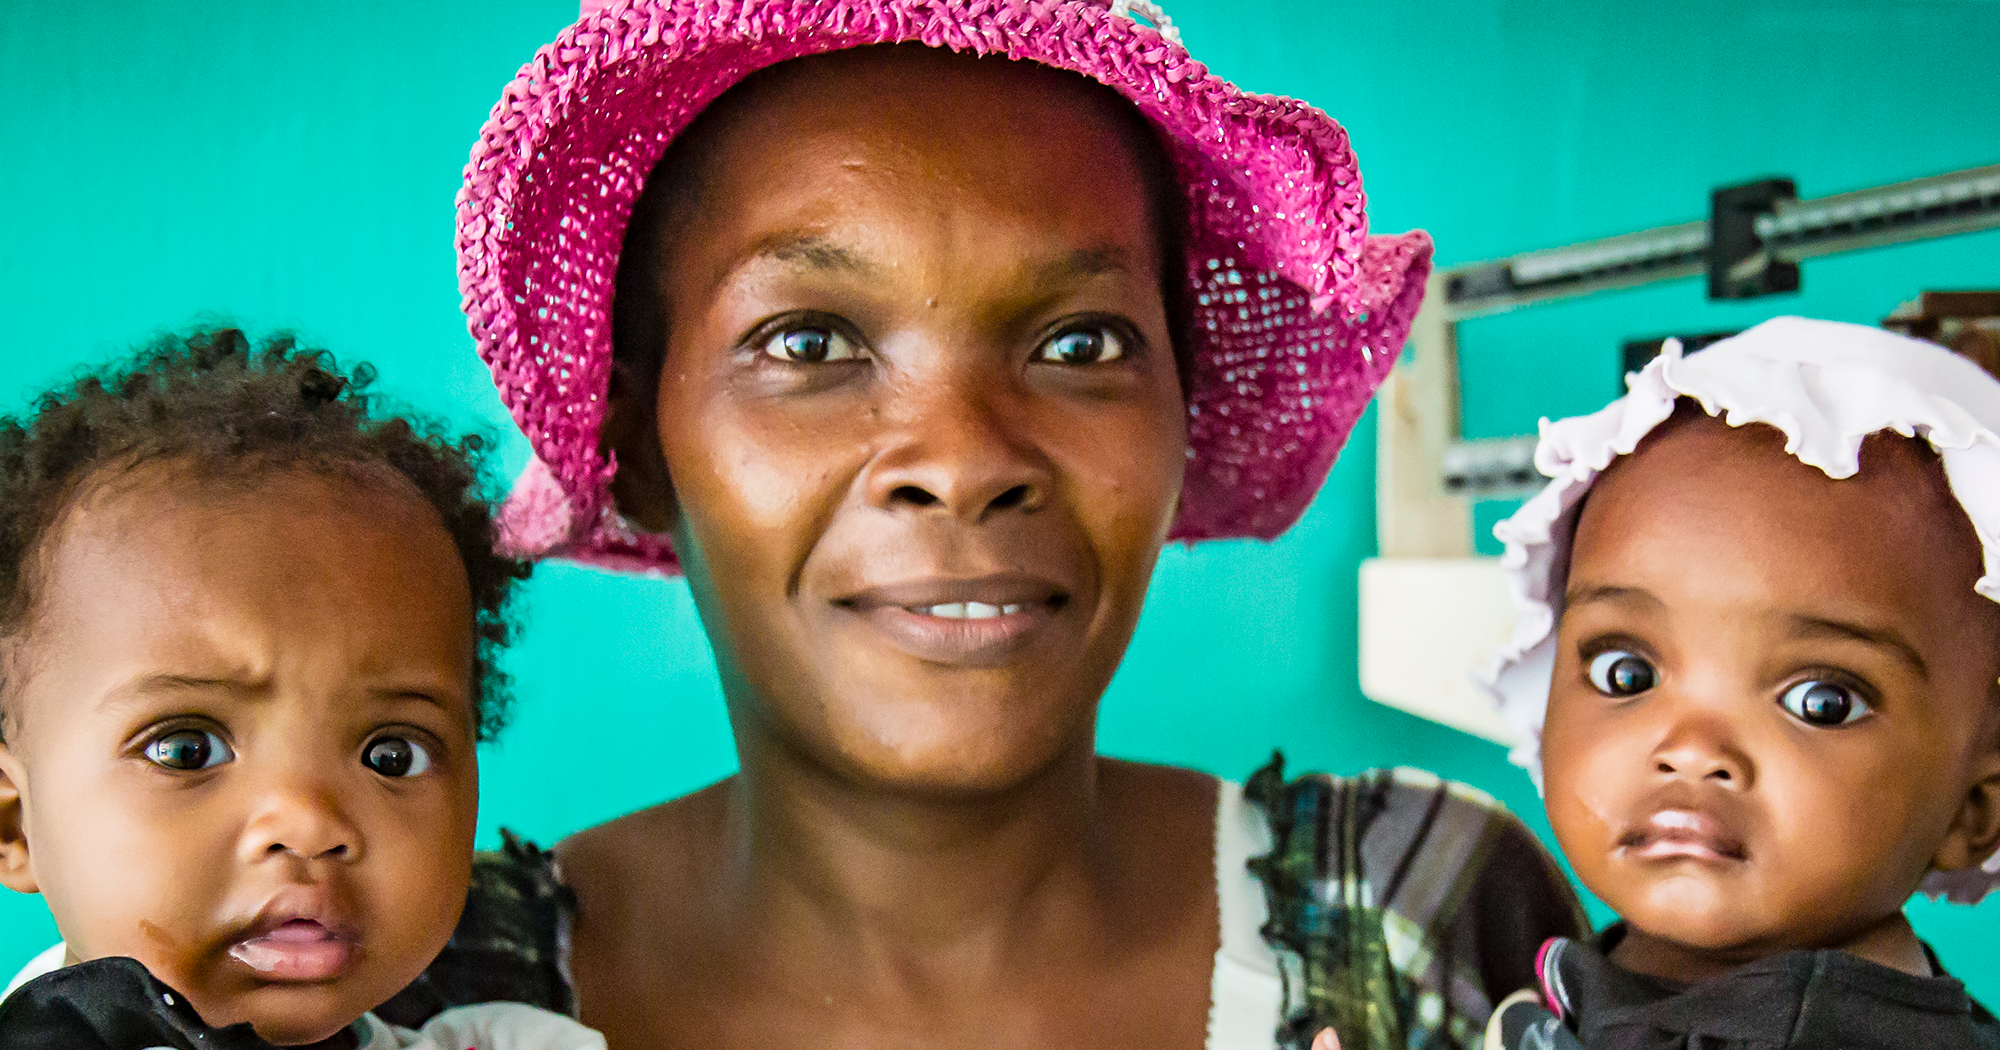 Haiti Unicef Malnourished Children Initiative Work